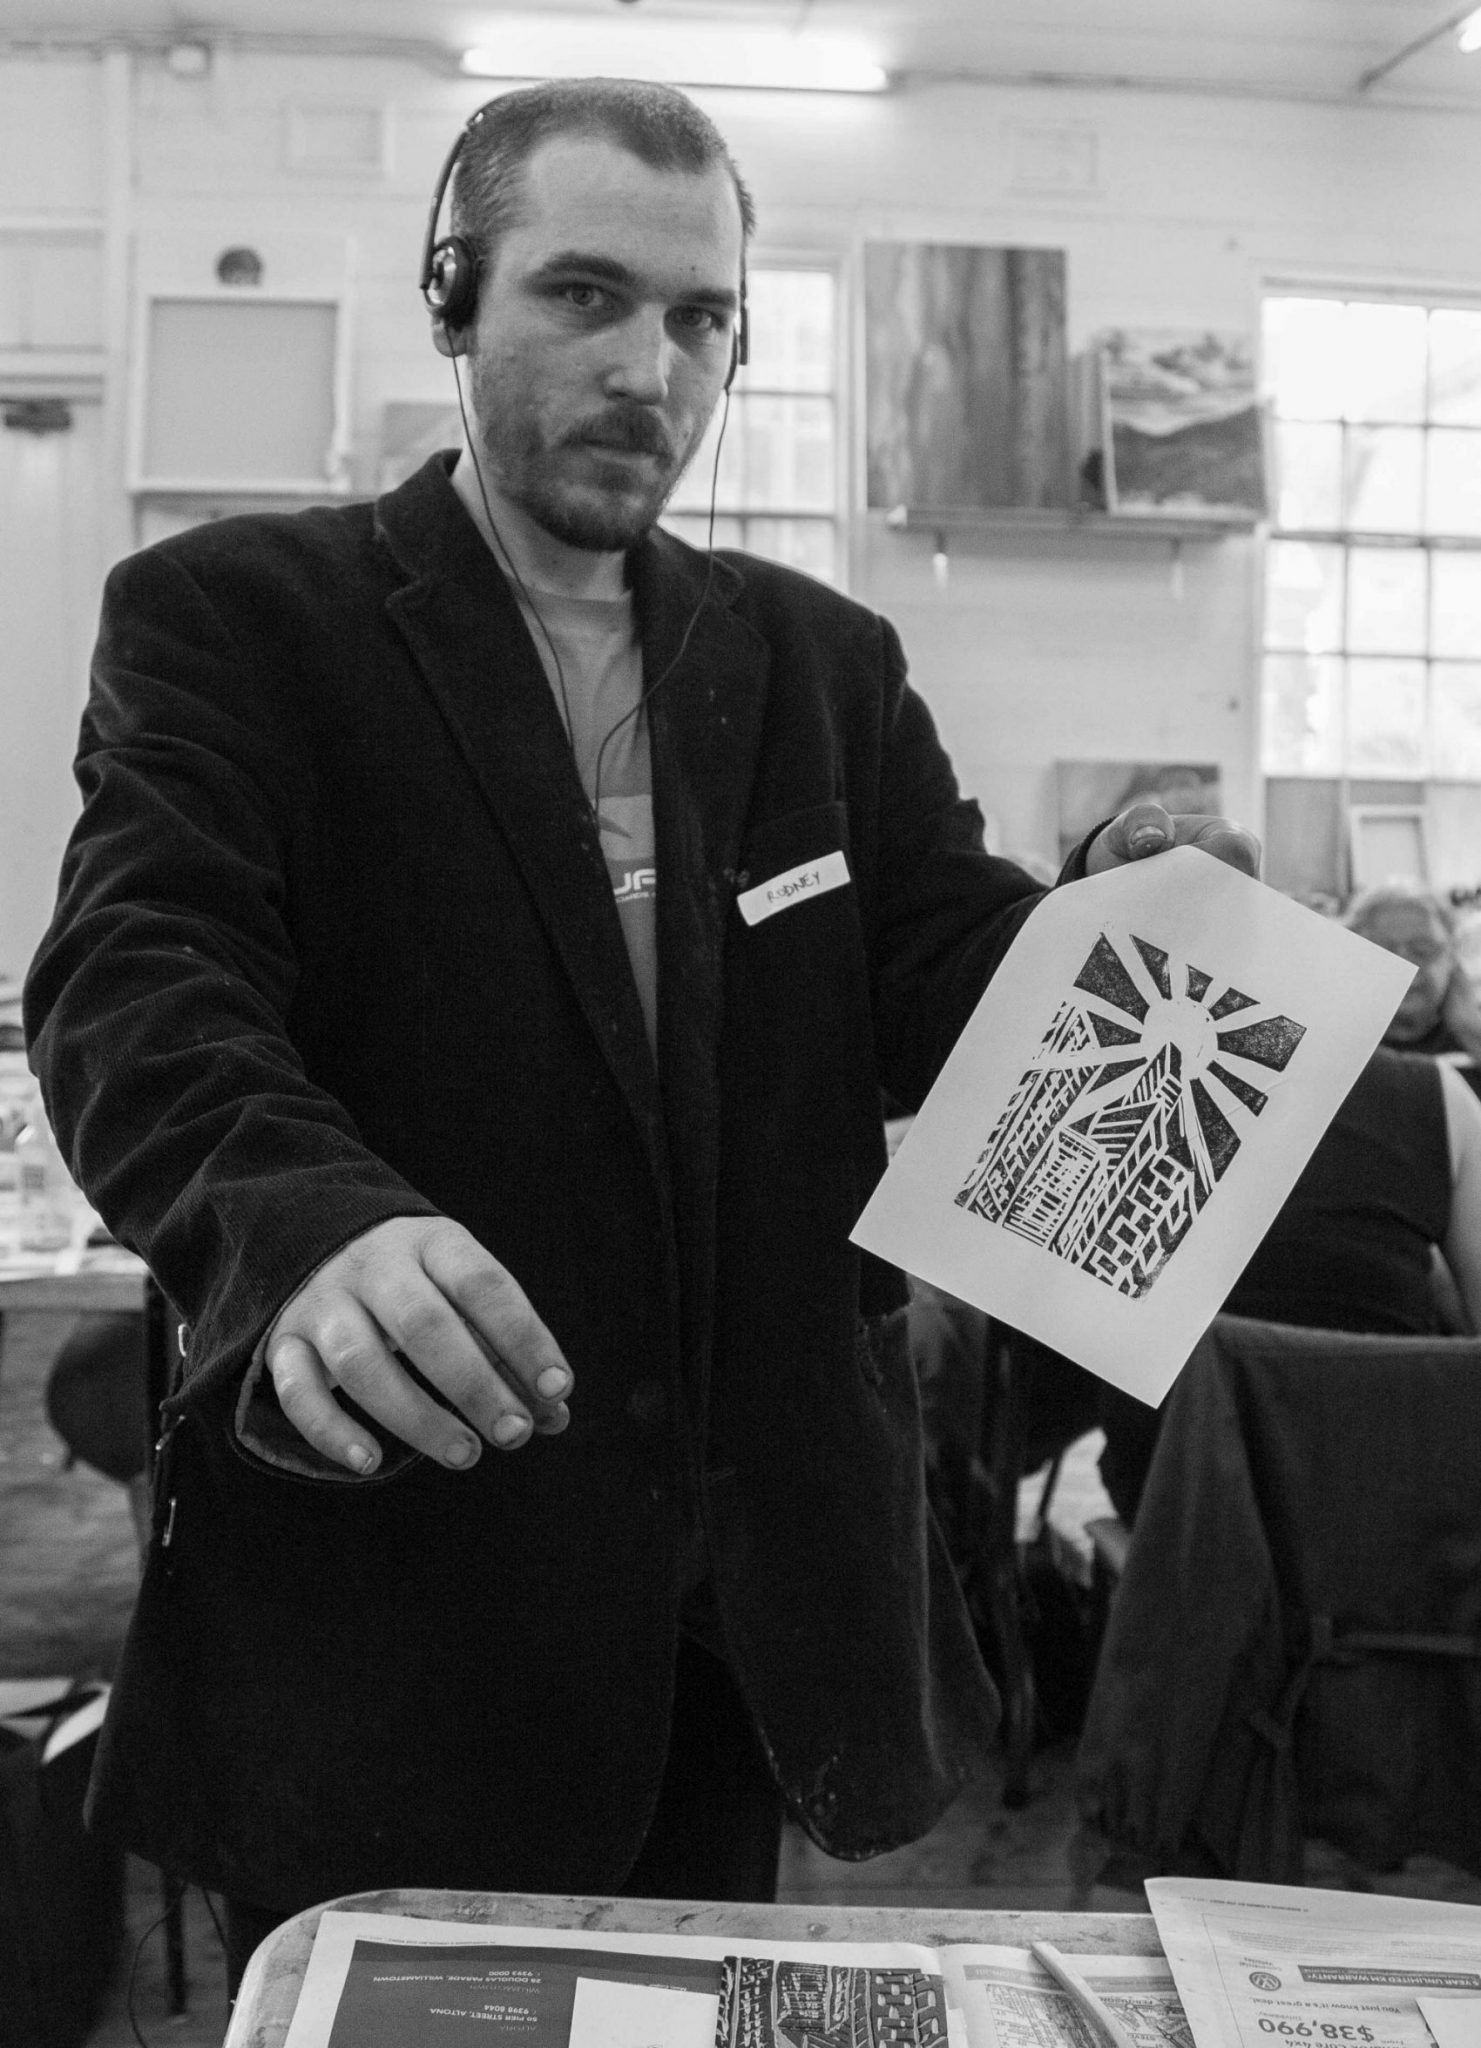 Open Canvas artist Rodney Mallee at a linocut workshop